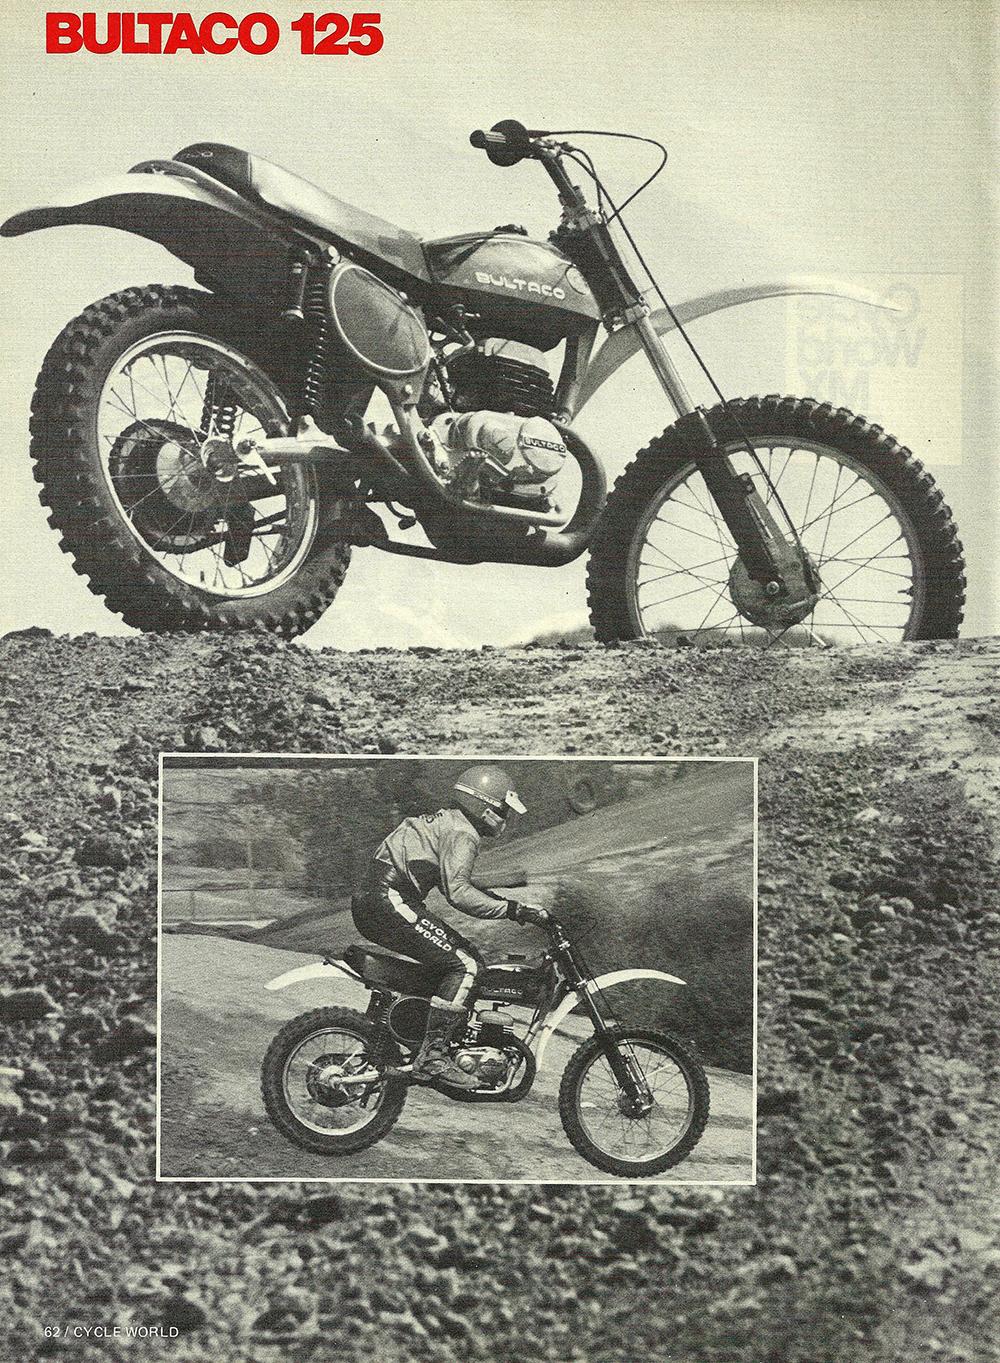 1976 Bultaco 125 Pursang road test 03.jpg